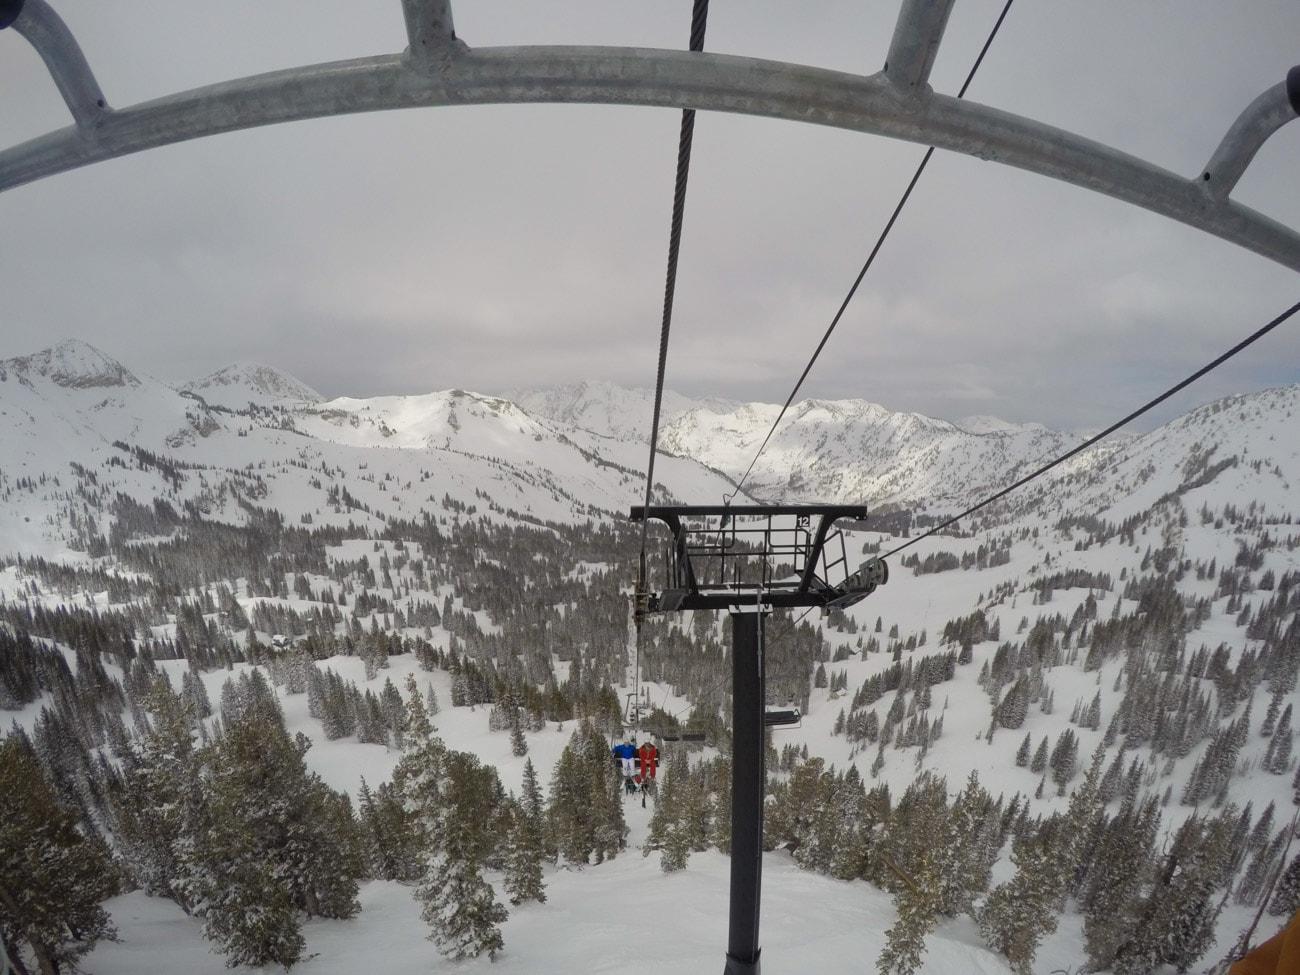 The Supreme Lift at Alta Ski Area